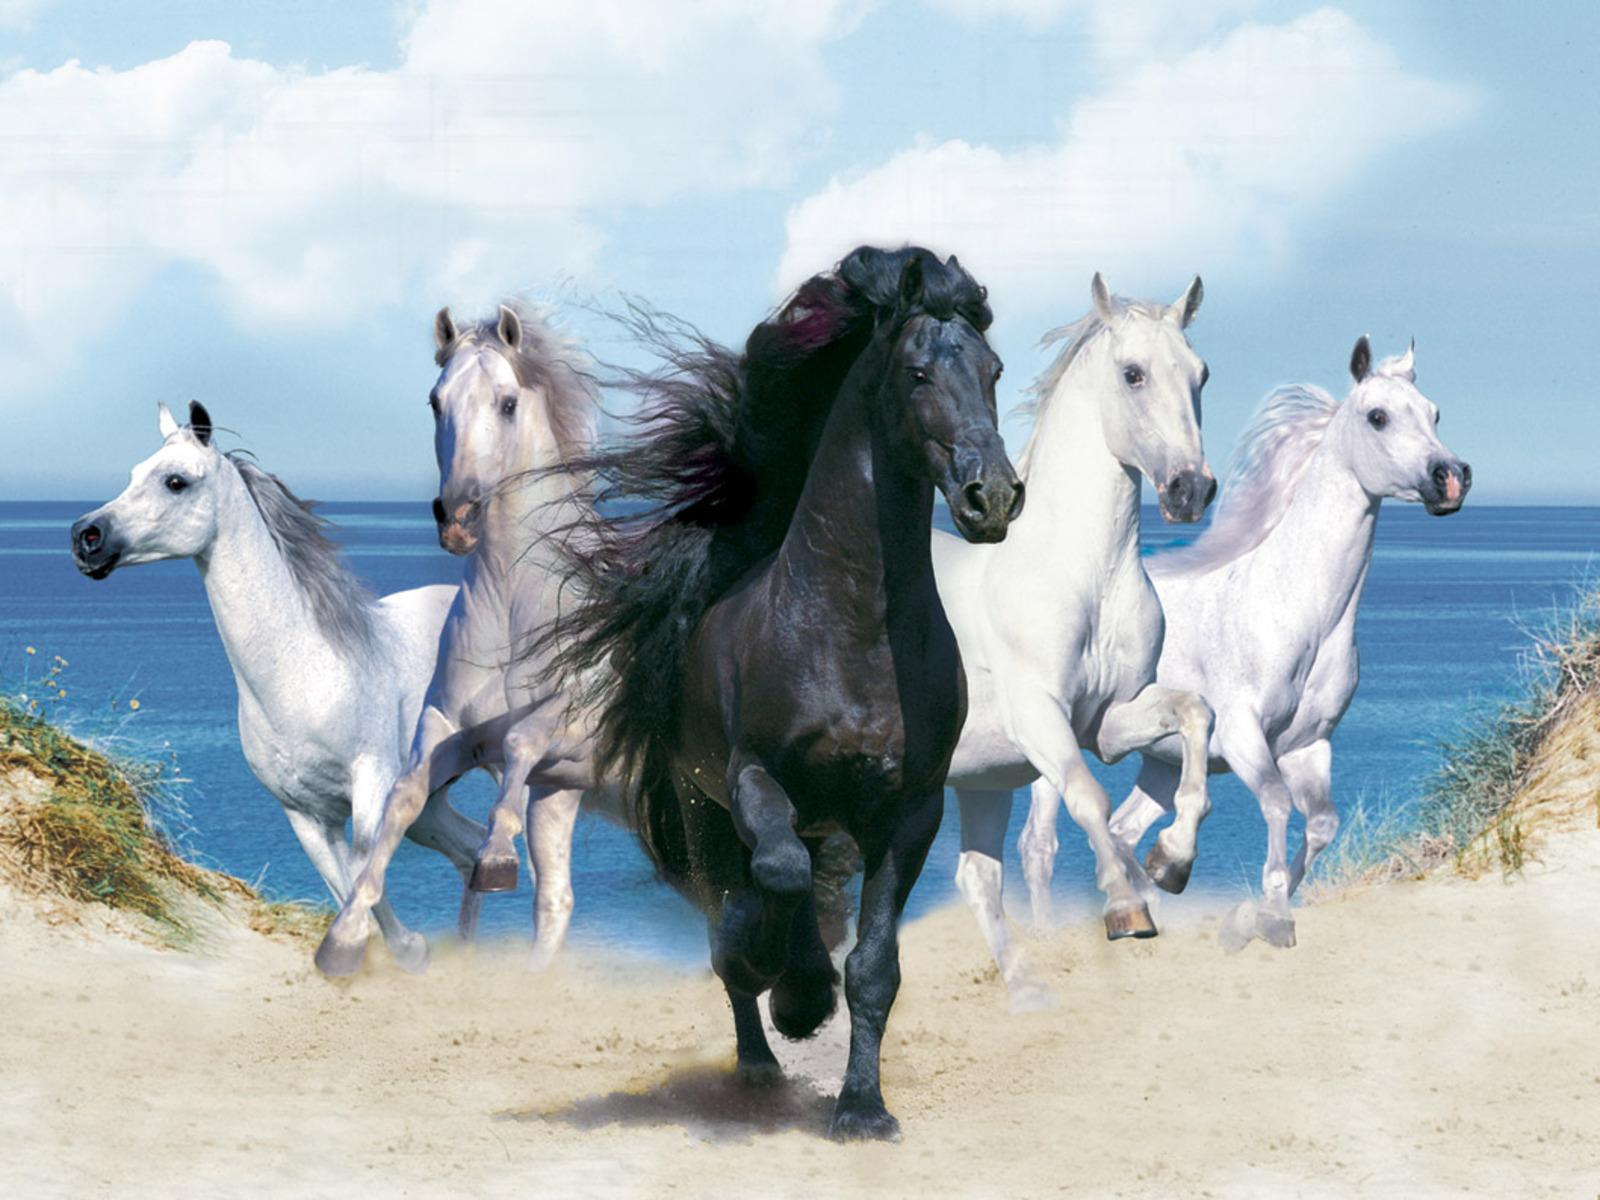 http://4.bp.blogspot.com/-CQpvOJJh18Y/TfLcAch2KBI/AAAAAAAAncY/vBIYlwGXqgU/s1600/Horses%2BWallpaper%2B%25283%25291.JPG